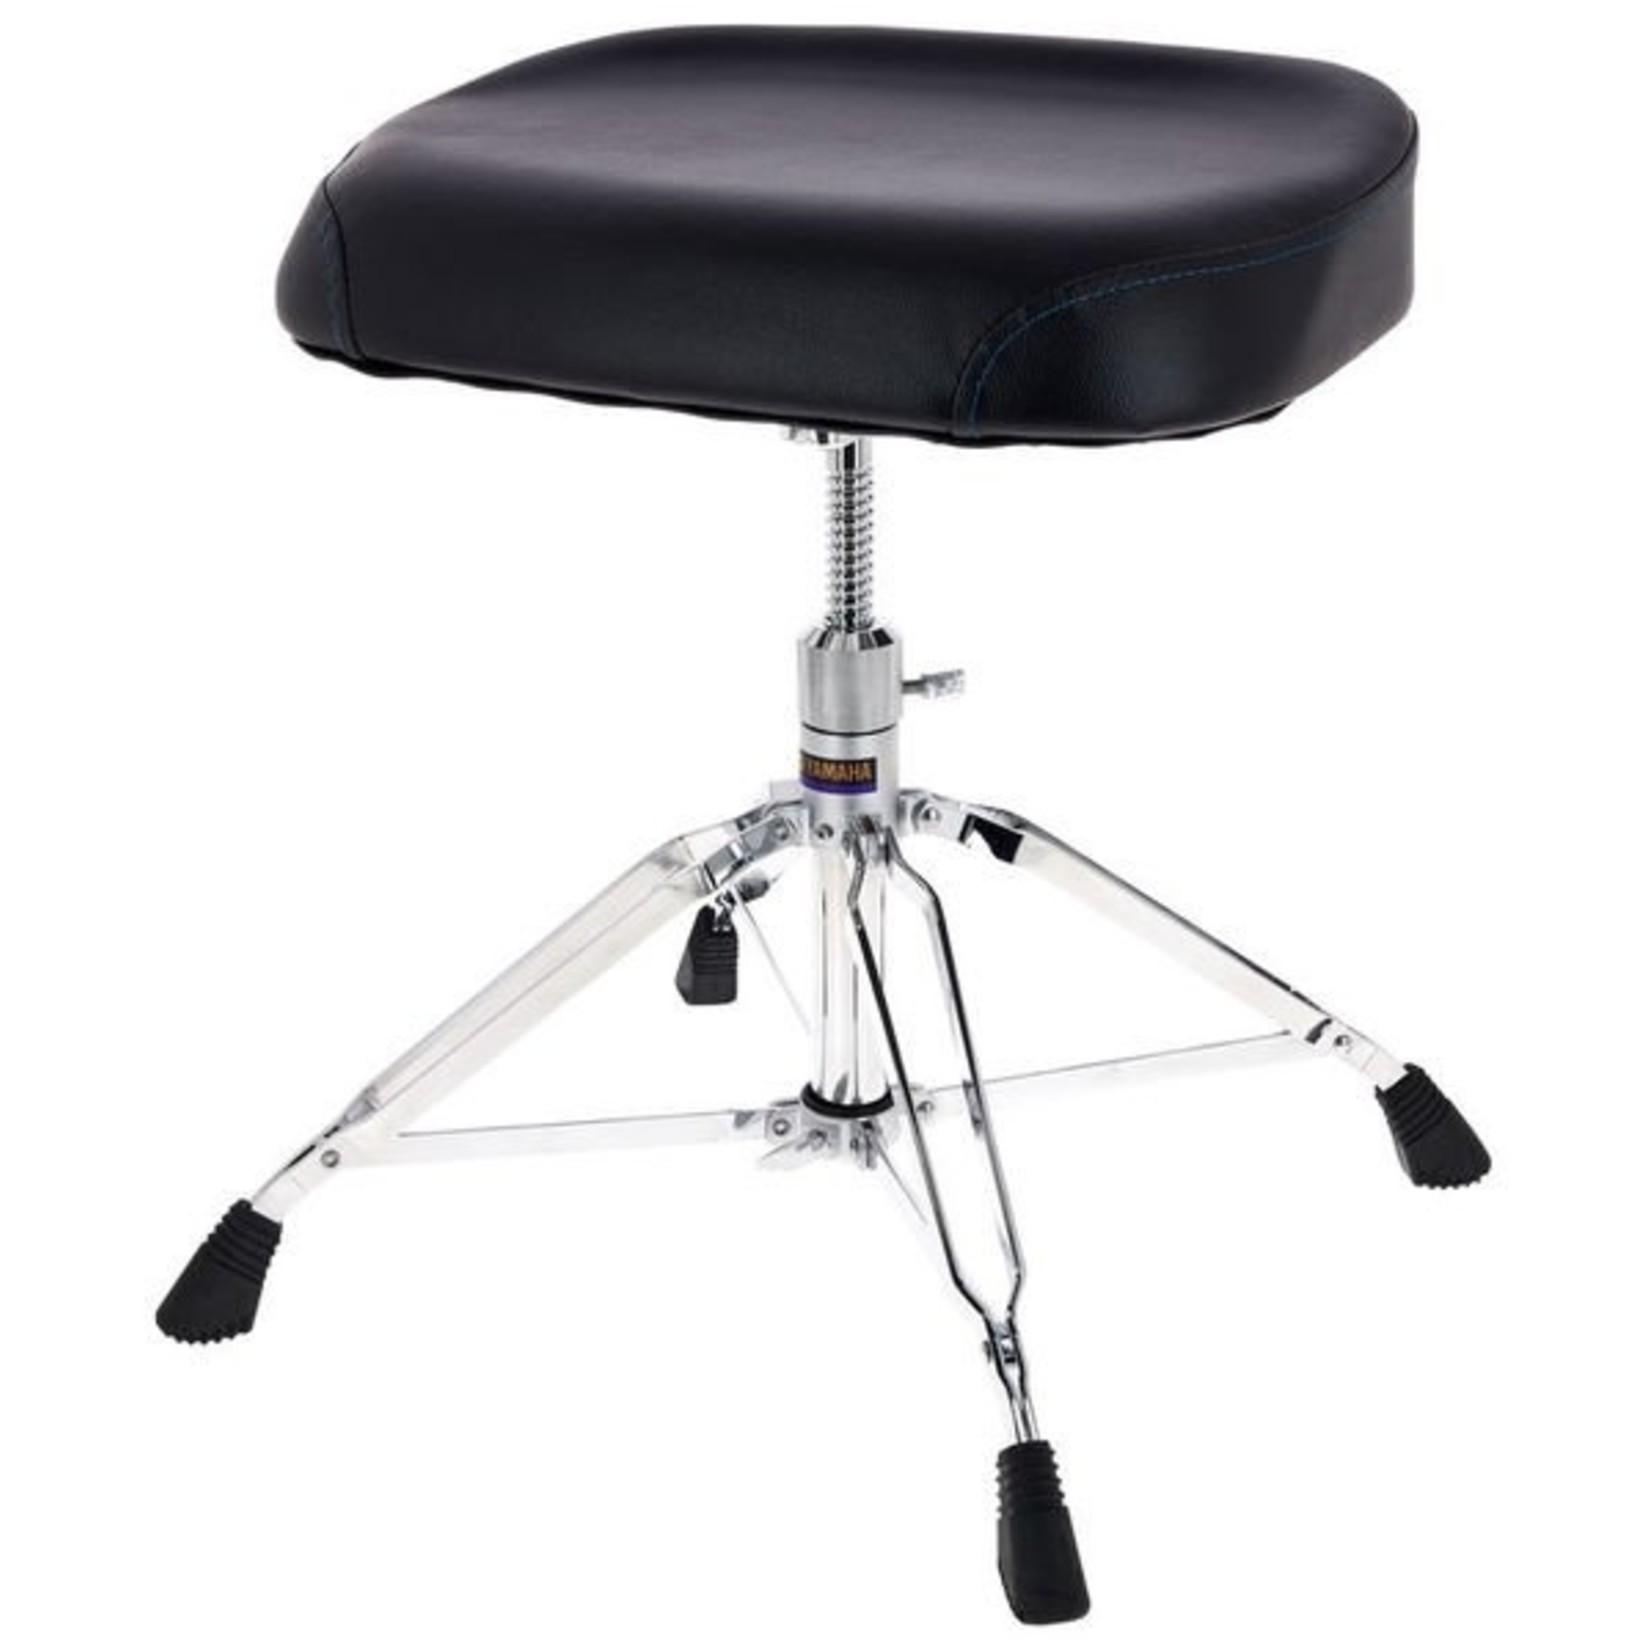 Yamaha Yamaha Drum Stool - Heavy Weight - Double Braced - Screw Height Adjustment - Bench Seat